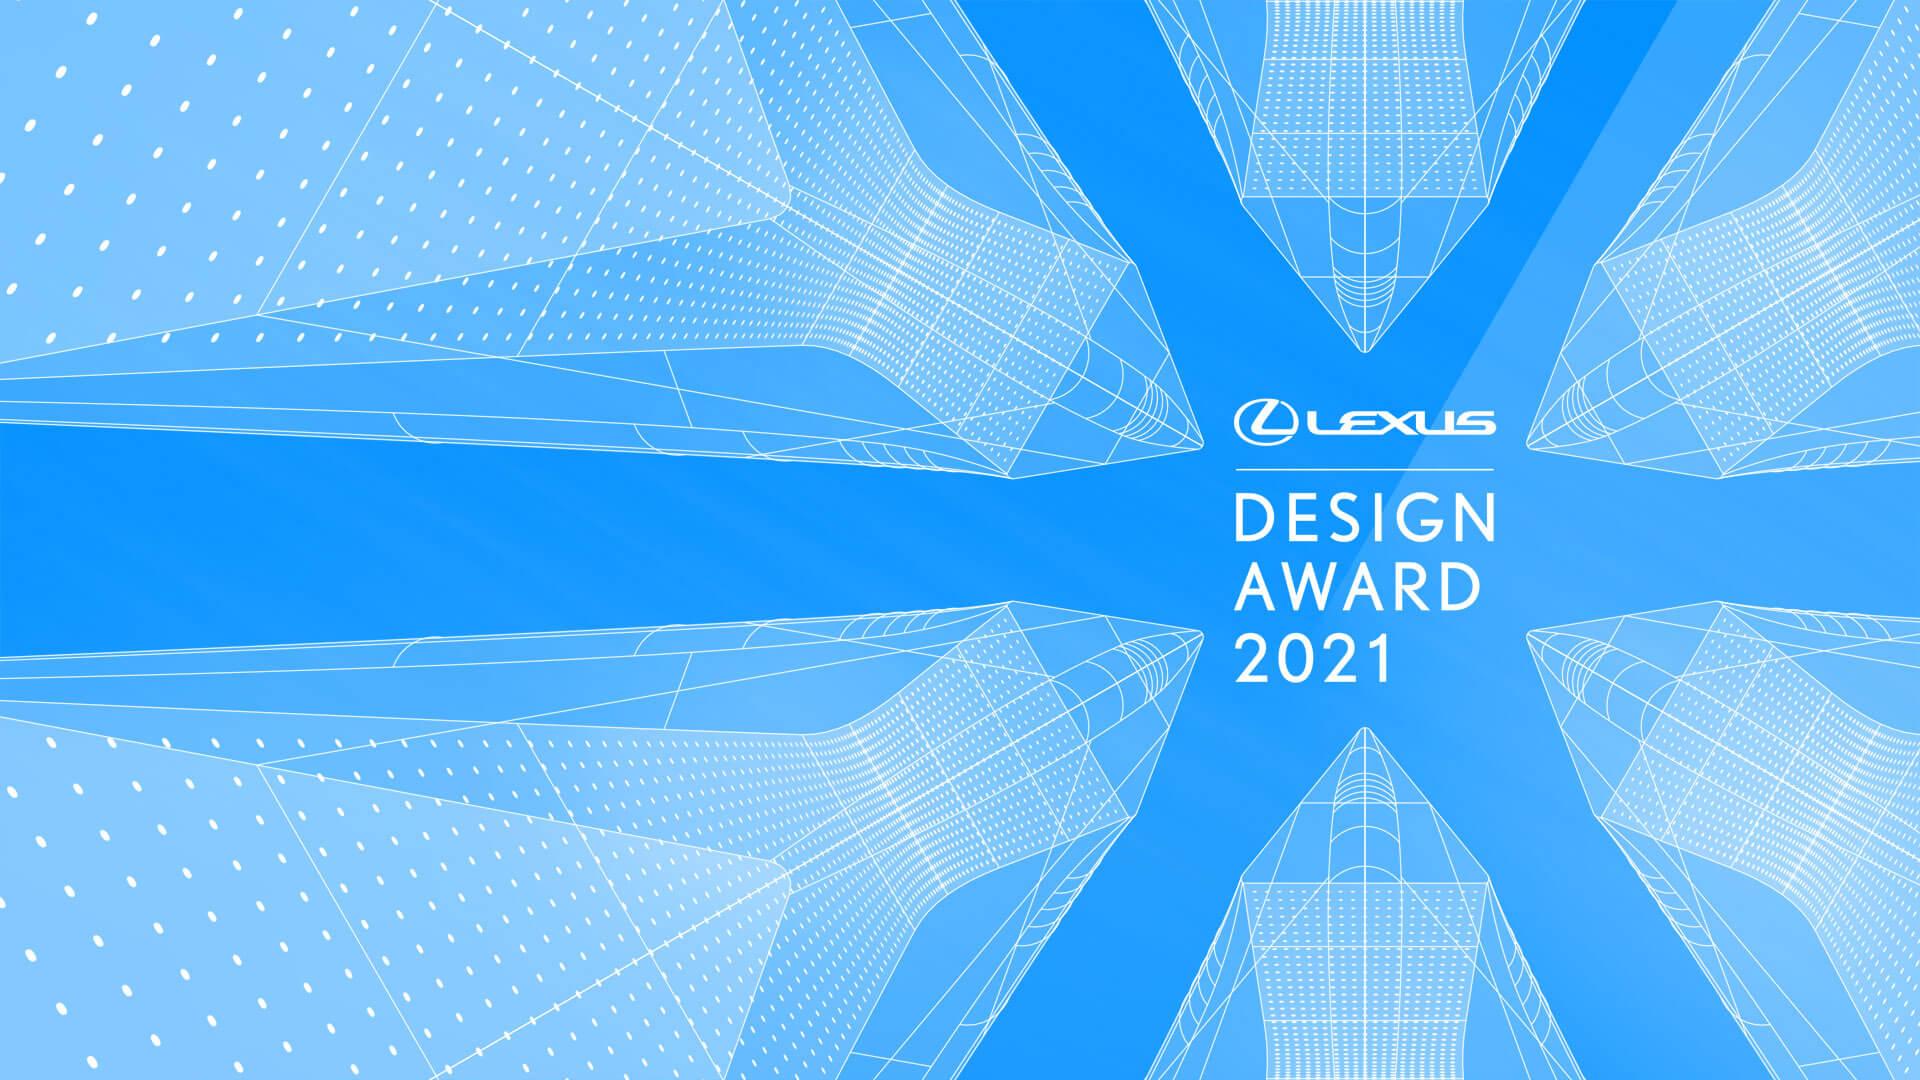 Українка Аліна Головатюк стала фіналісткою премії Lexus Design Award 2021